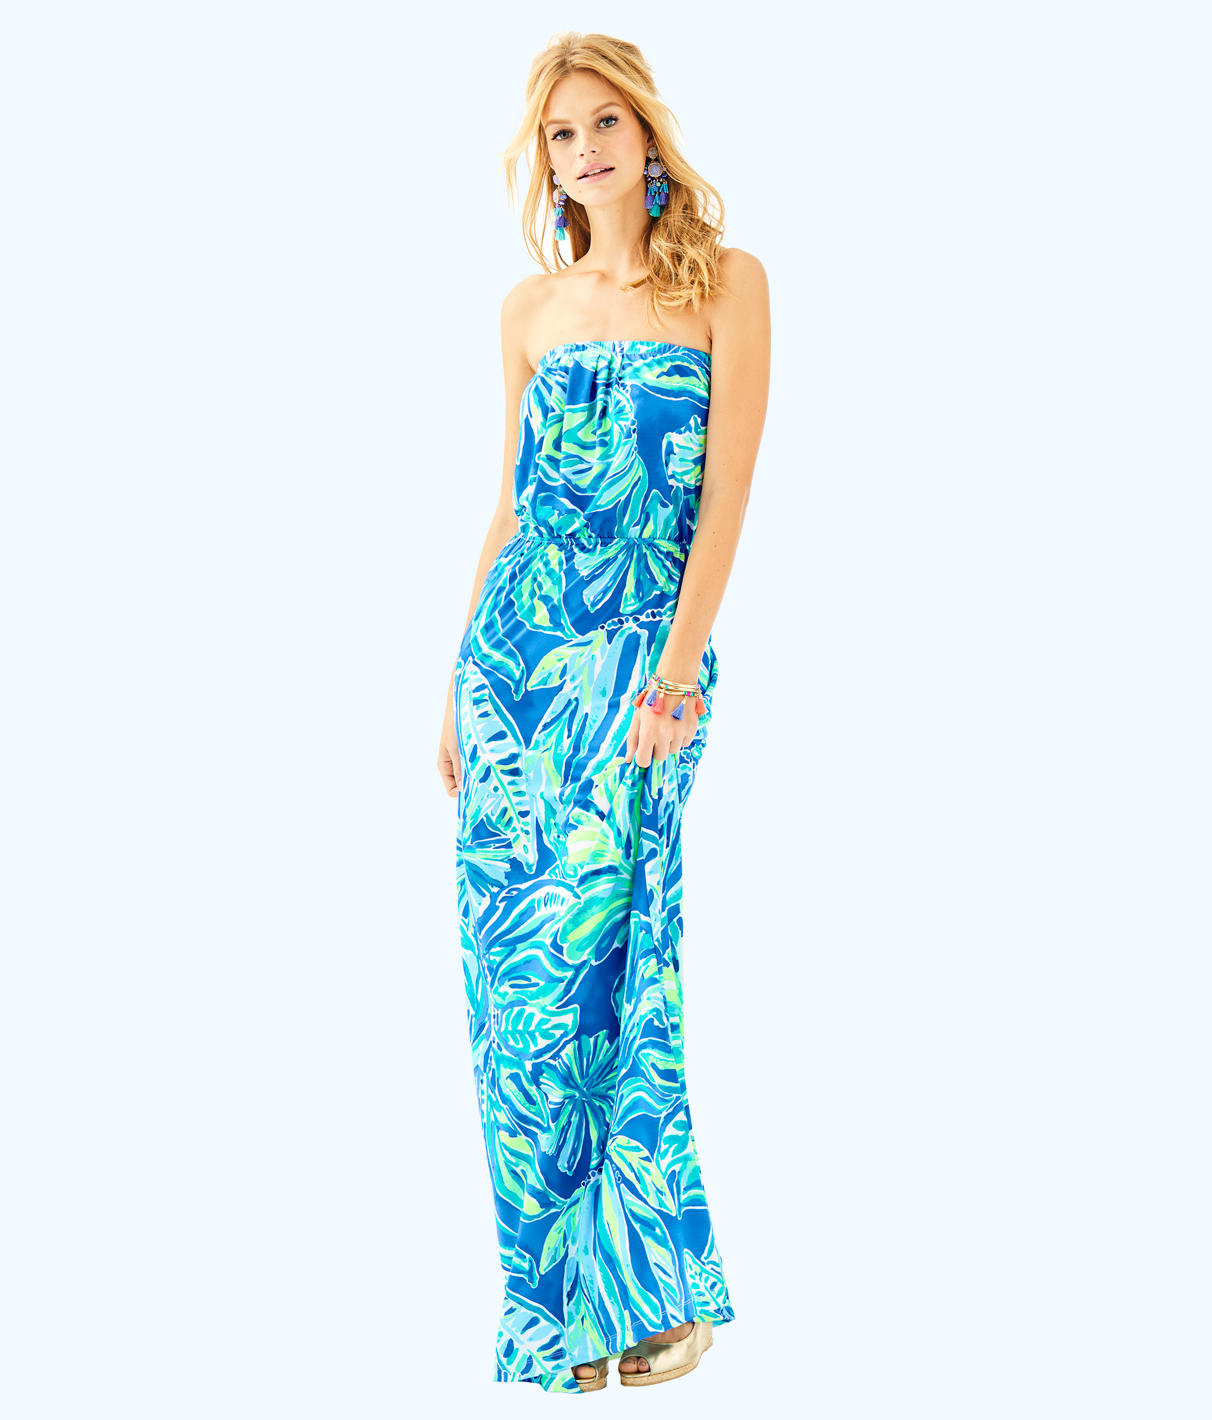 Lilly Pulitzer Lilly Pulitzer Womens Marlisa Maxi Dress